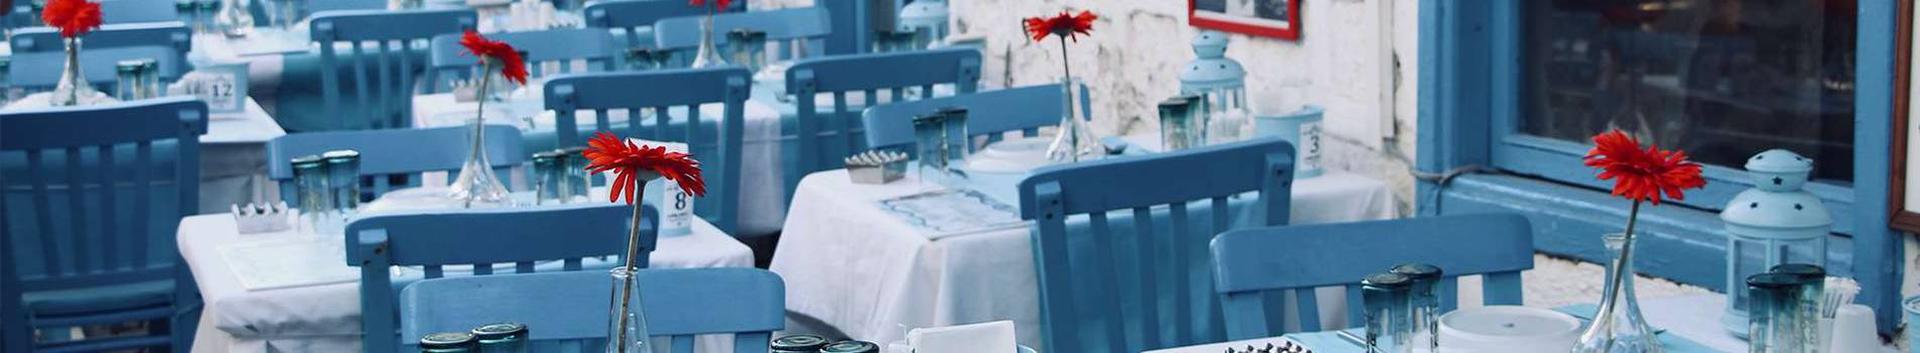 56101_toitlustus-restoran-jm-_84298312_xl.jpg